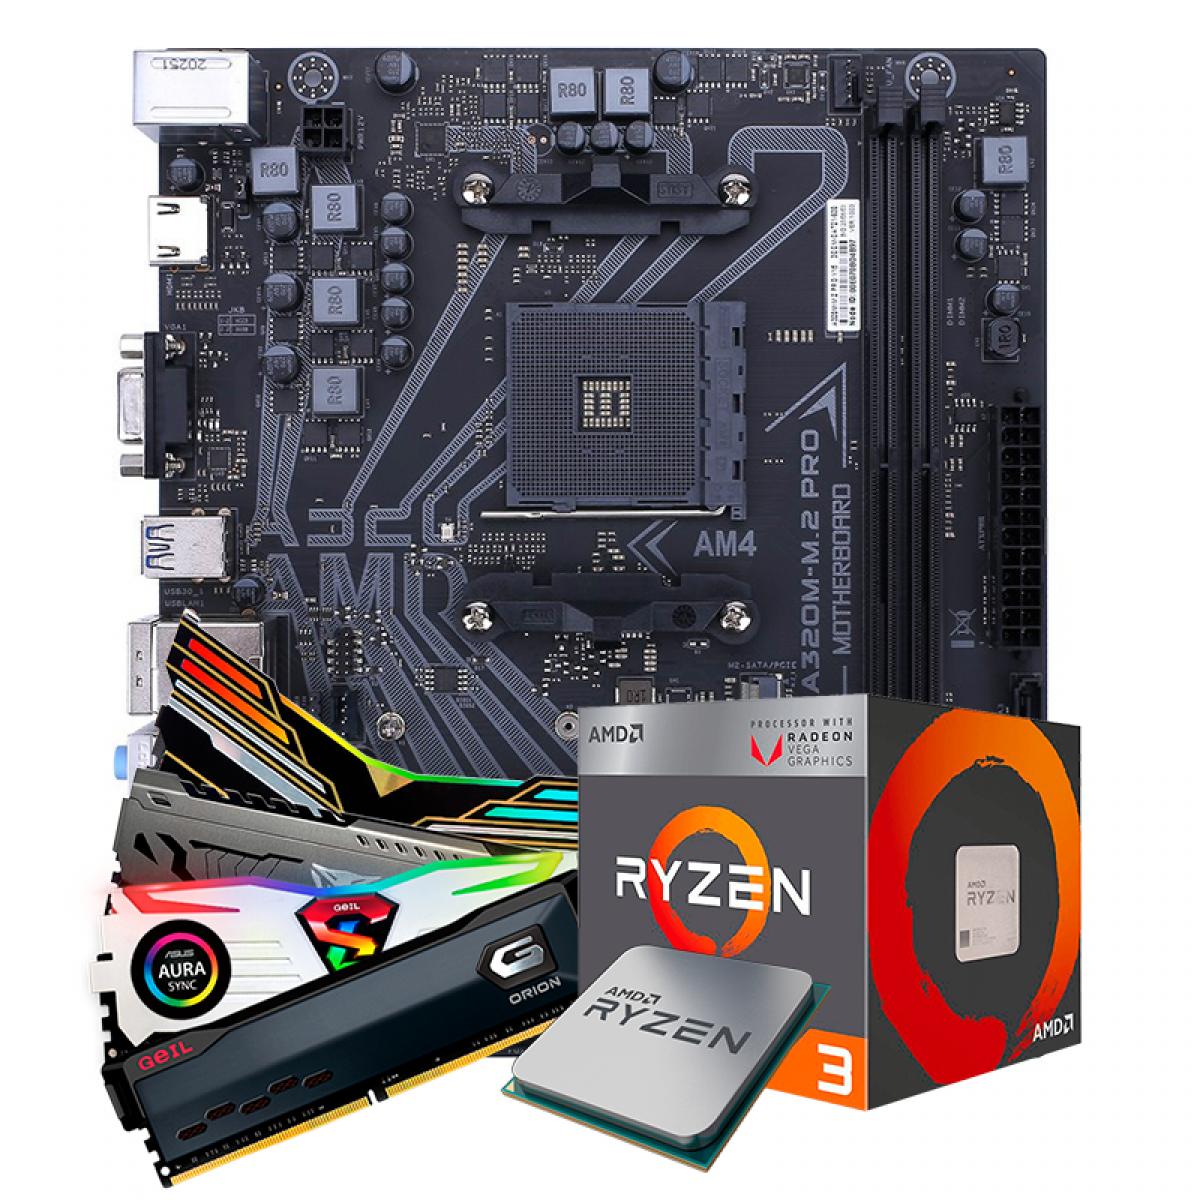 Kit Upgrade, AMD Ryzen 3 2200G, Colorful A320M-M.2 PRO V15, Memória DDR4 8GB 3000MHz